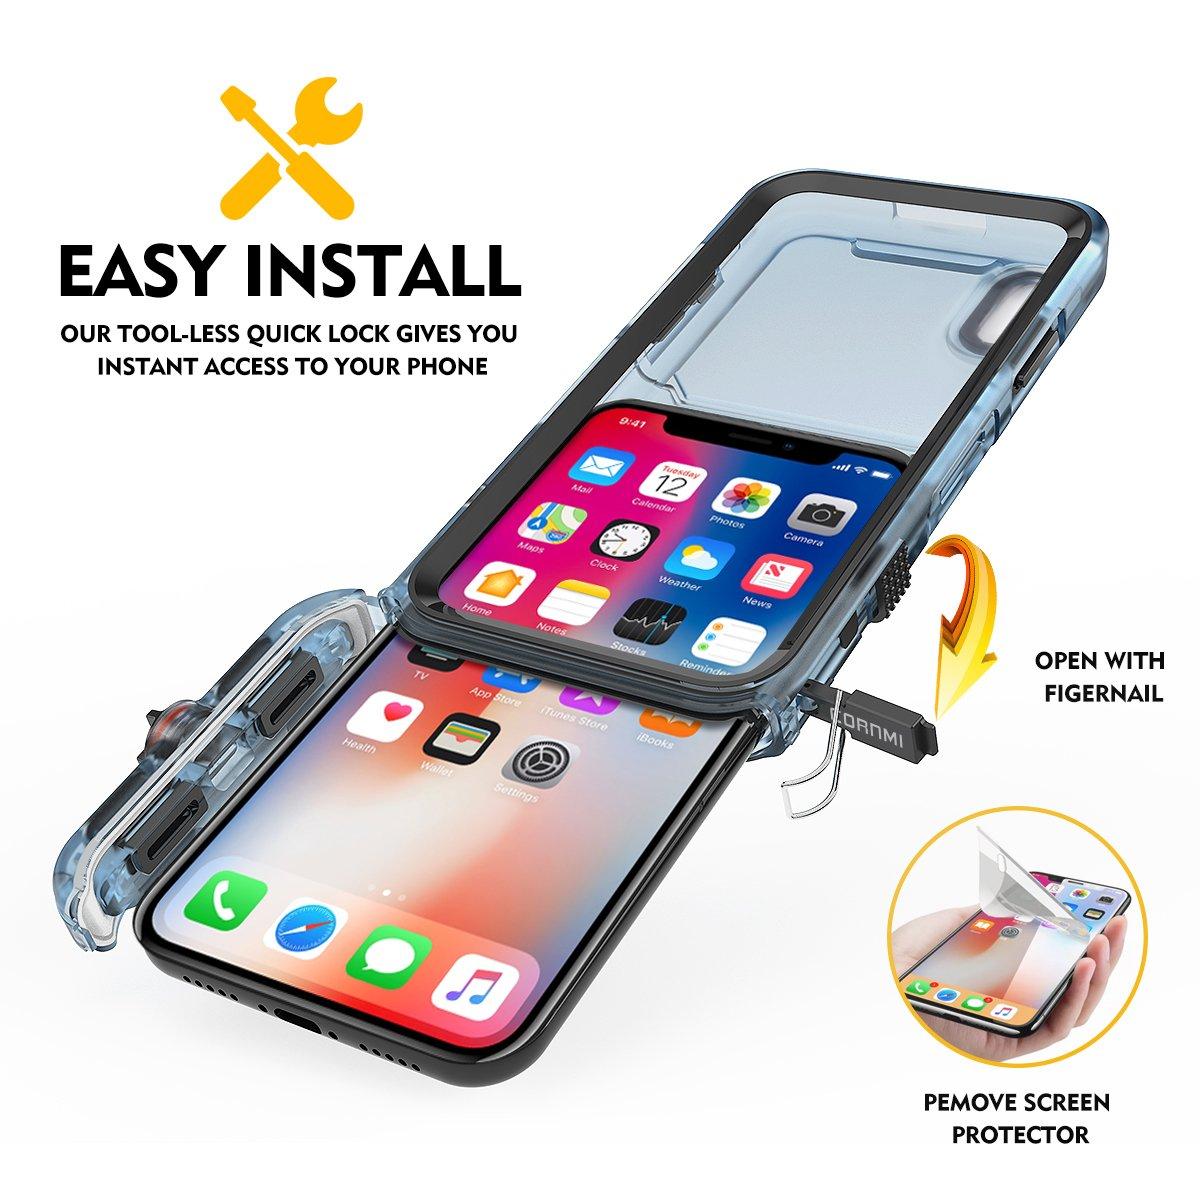 Cornmi iPhone X Waterproof Case, Full Sealed IP68 Certified Waterproof Shockproof Snowproof Protection Underwater Case for iPhone X 5.2inch (Black) by Cornmi (Image #4)